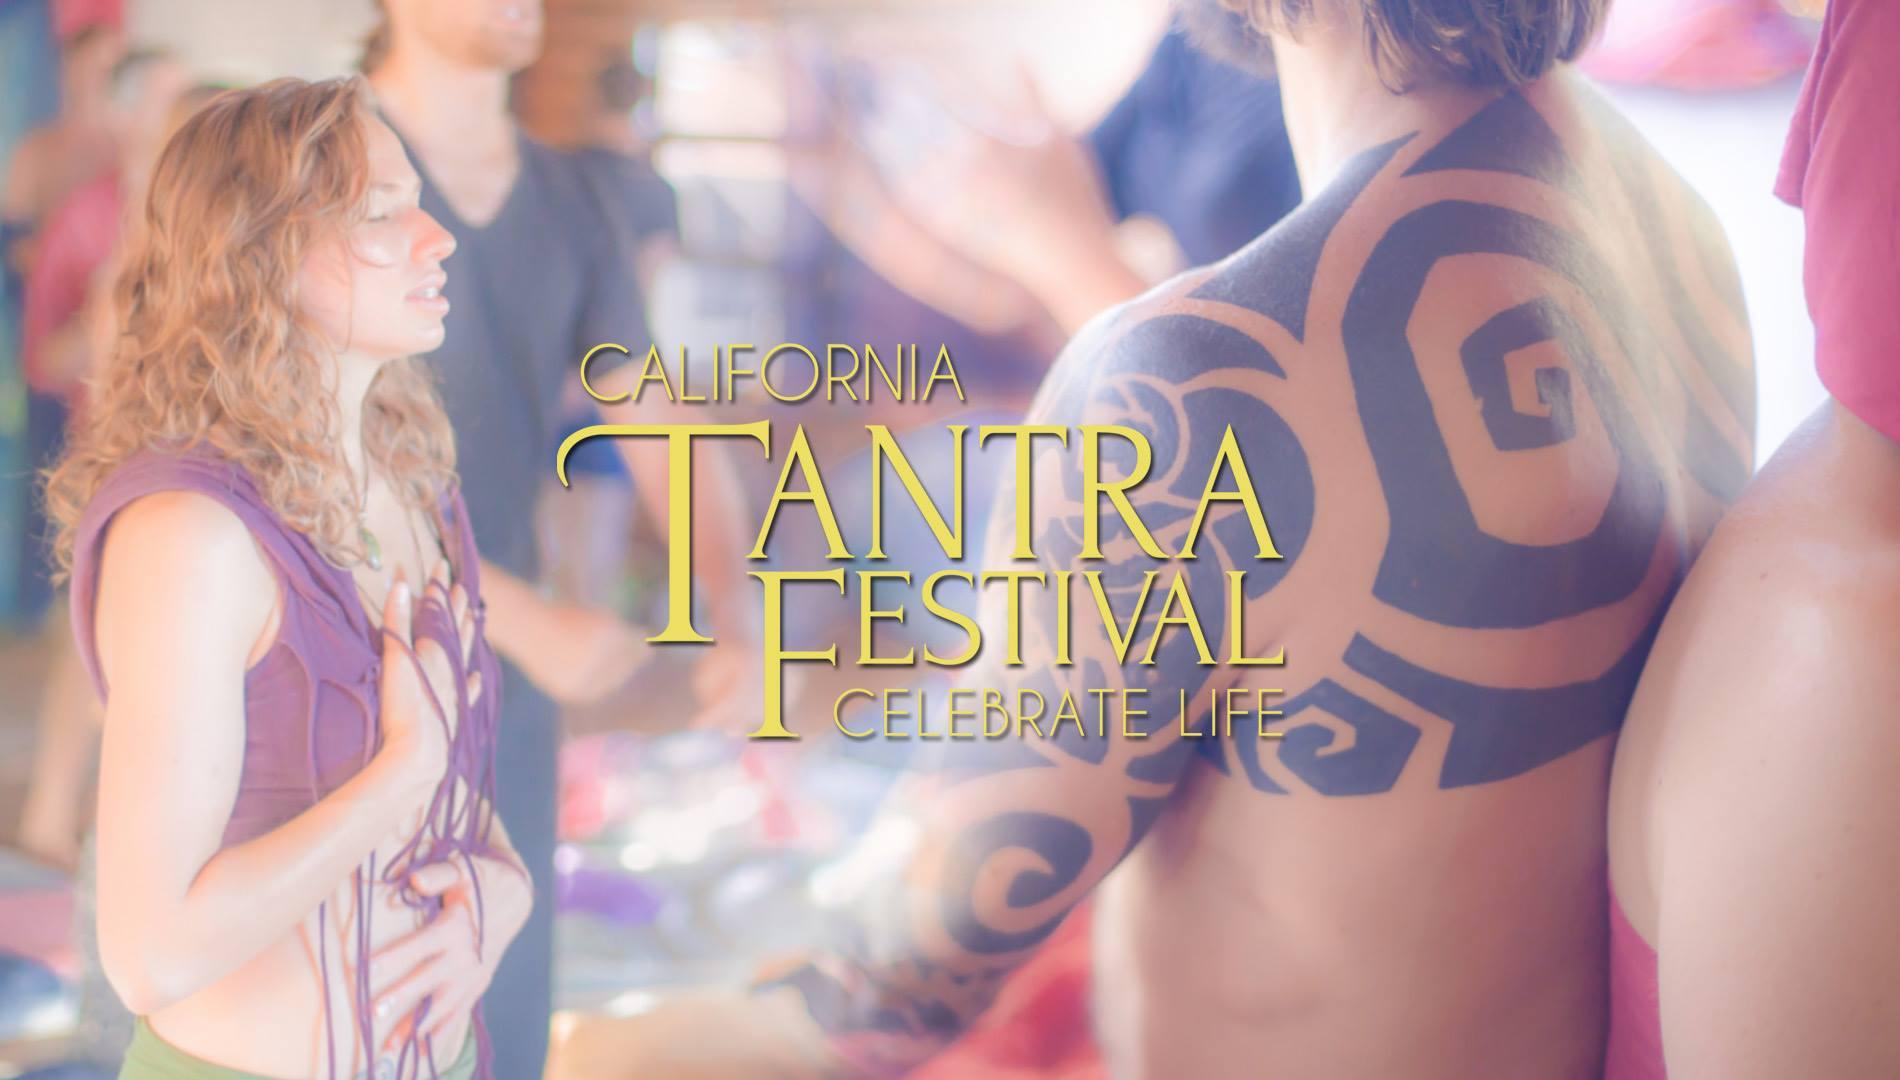 California Tantra Festival 2019 - Everyday Tantra